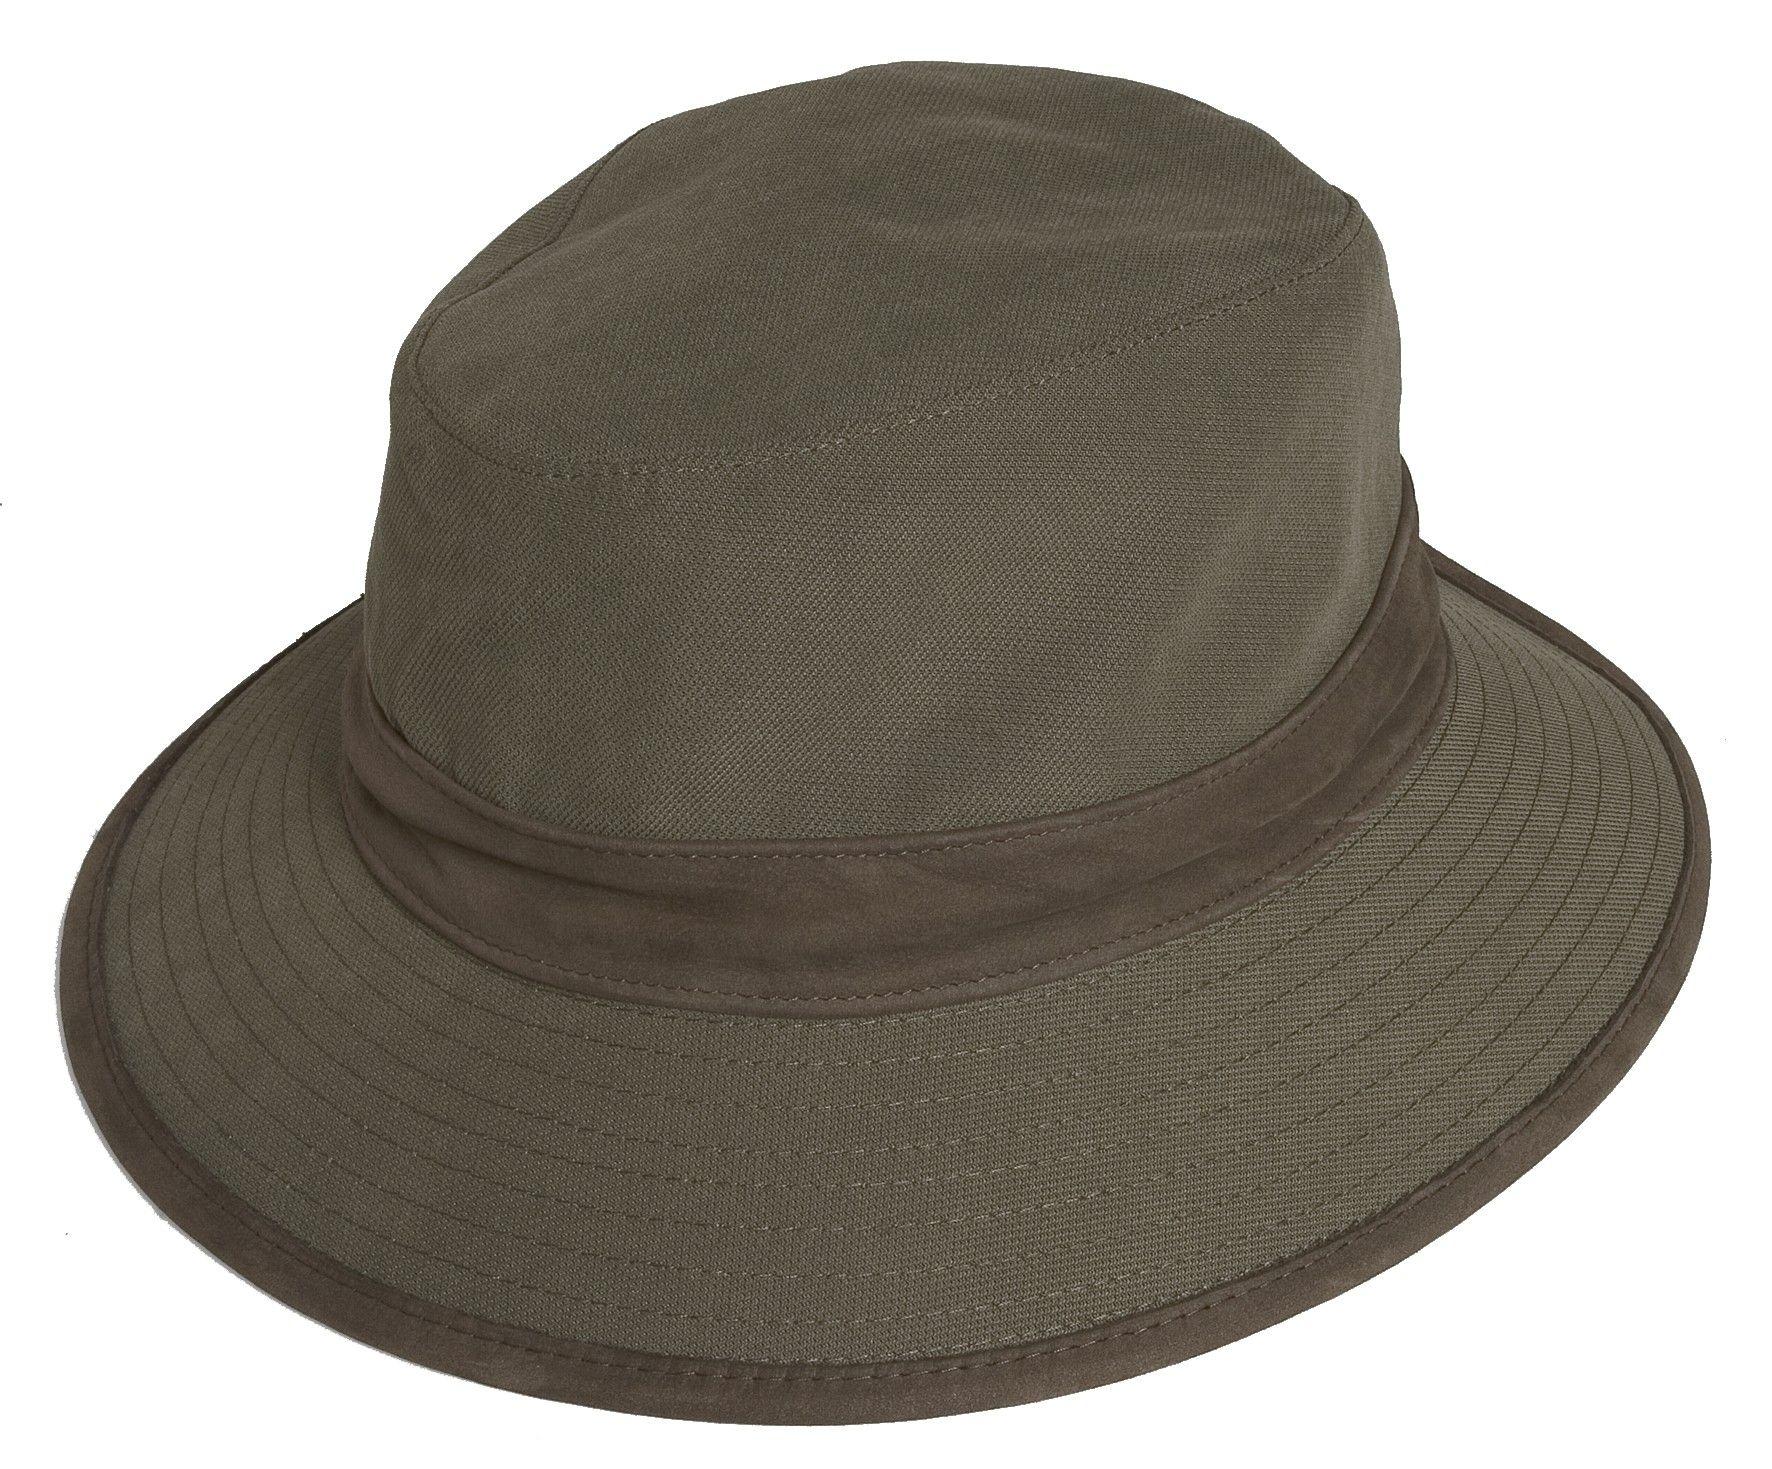 78b18a96af1 Hoggs Turnberry Fleece Lined Waterproof Hat